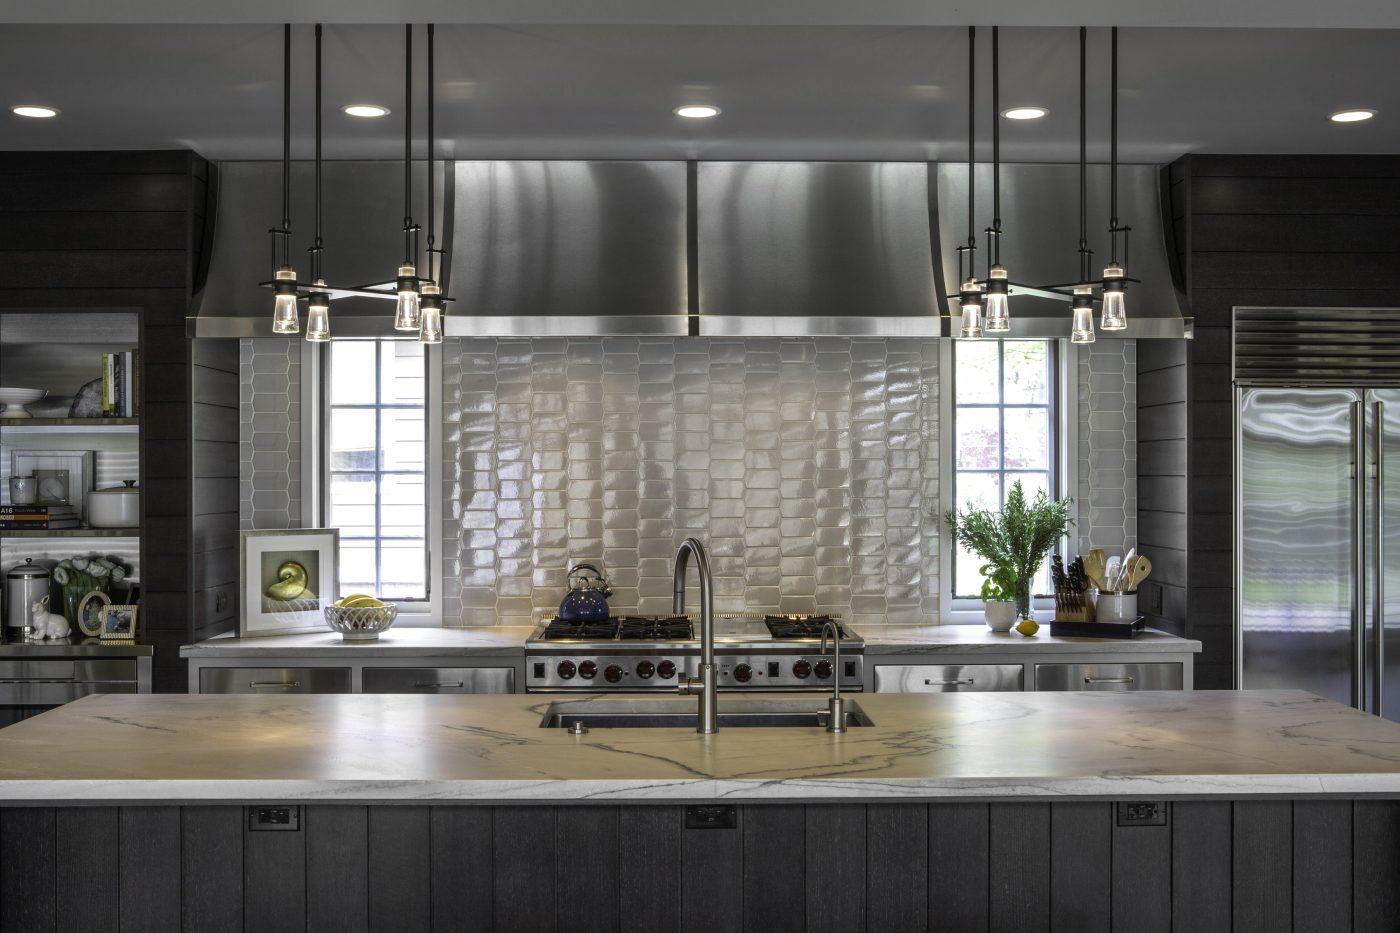 Modern kitchen design with dark walnut wood and painted cabinets. Large stainless steel vent hood over a Wolf range. Subzero refrigerator. Ann Sacks Tile. Hubbarton Forge pendant lights. White kitchen. Kitchen Renovation. Modern interior.